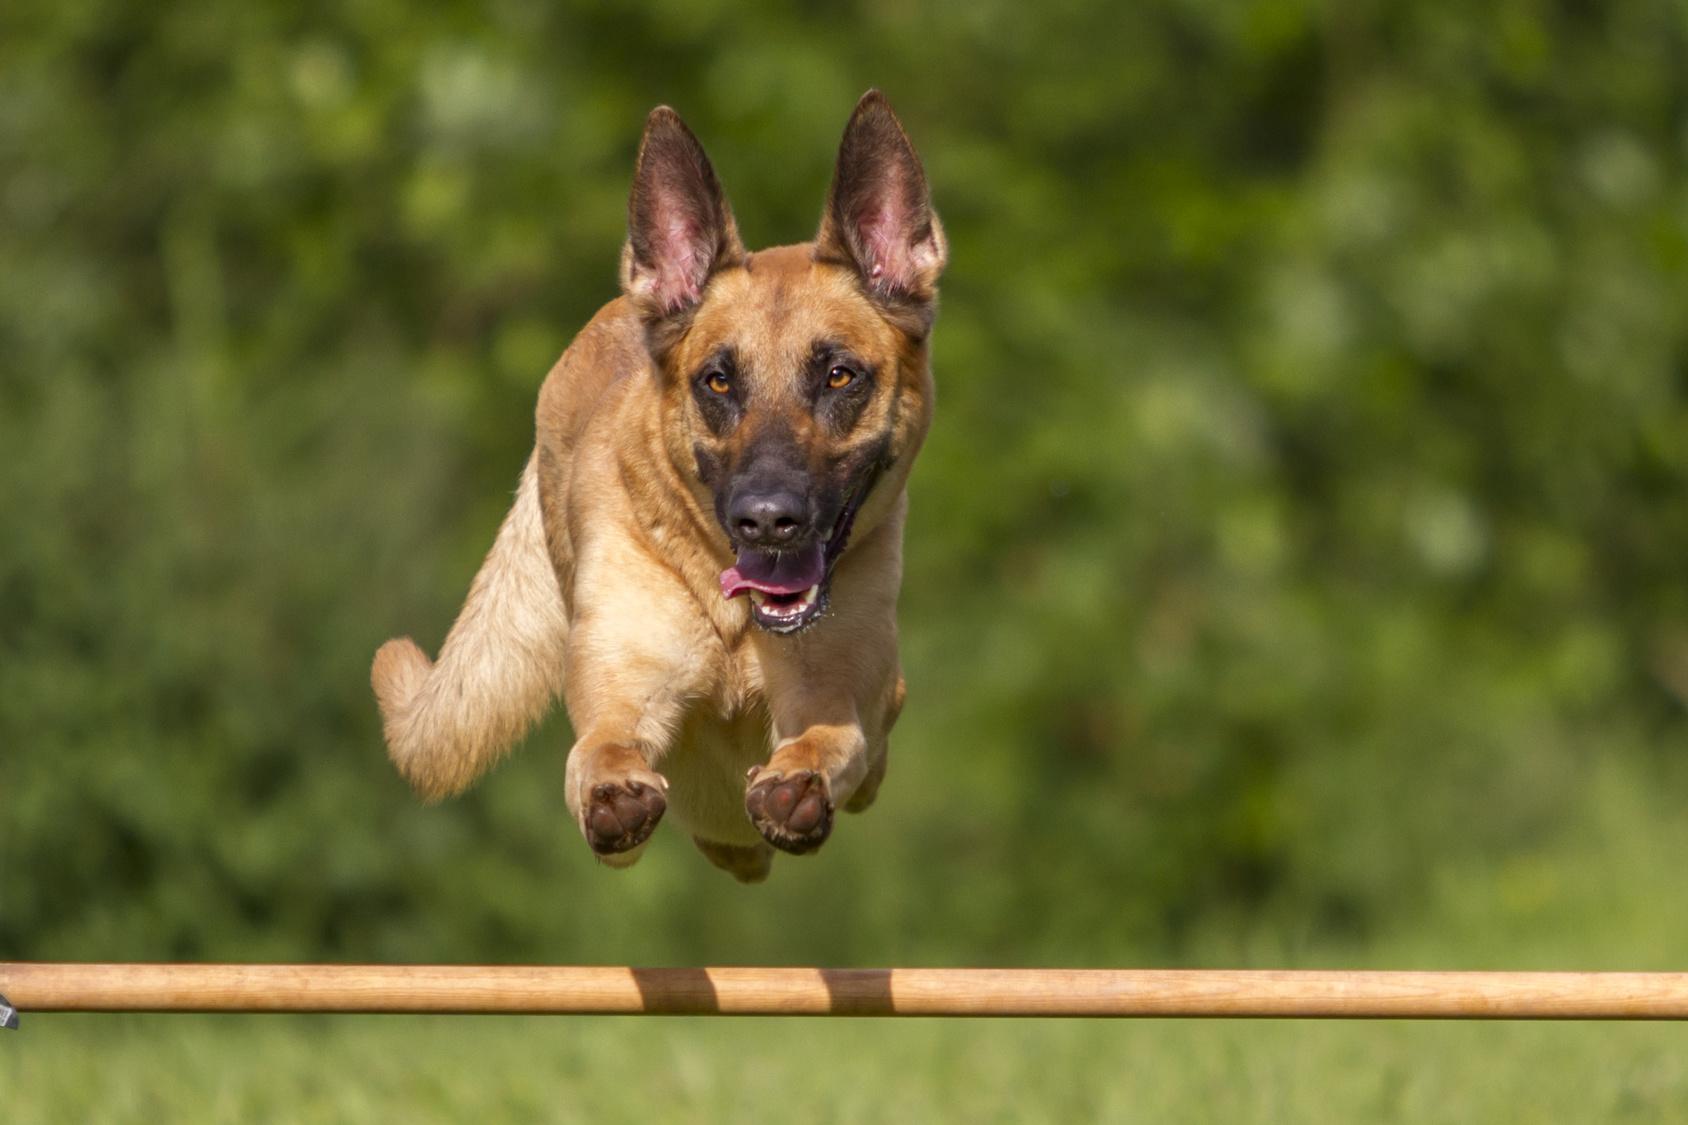 Agility - Malinois beim Sprung über Hürde